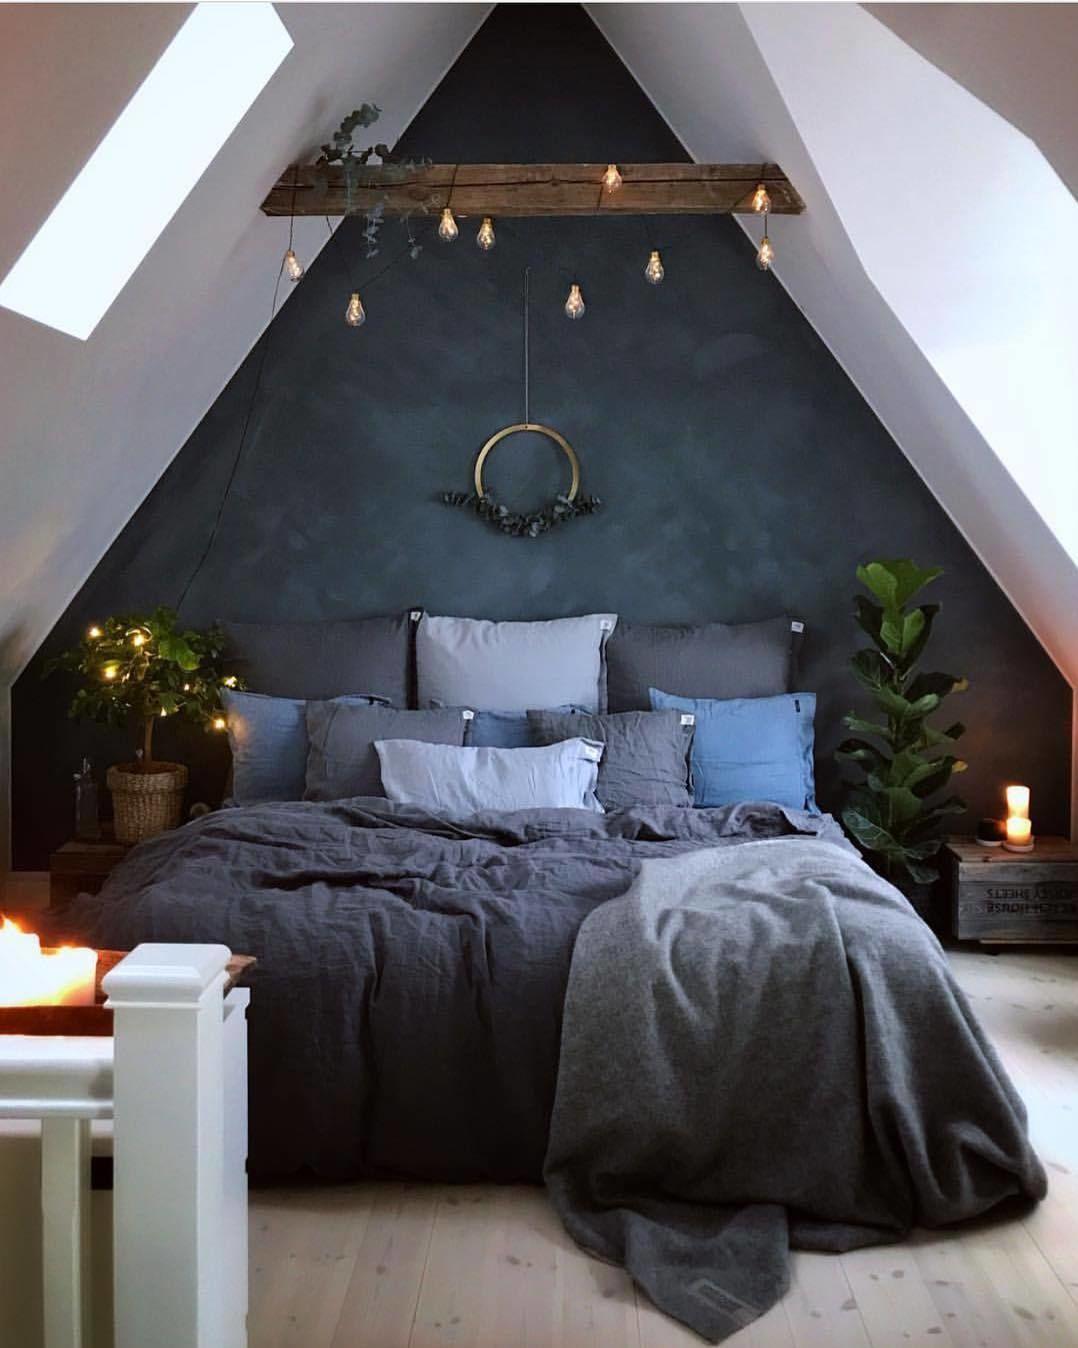 Interior Design u0026 Decor on Instagram u201cInspiring